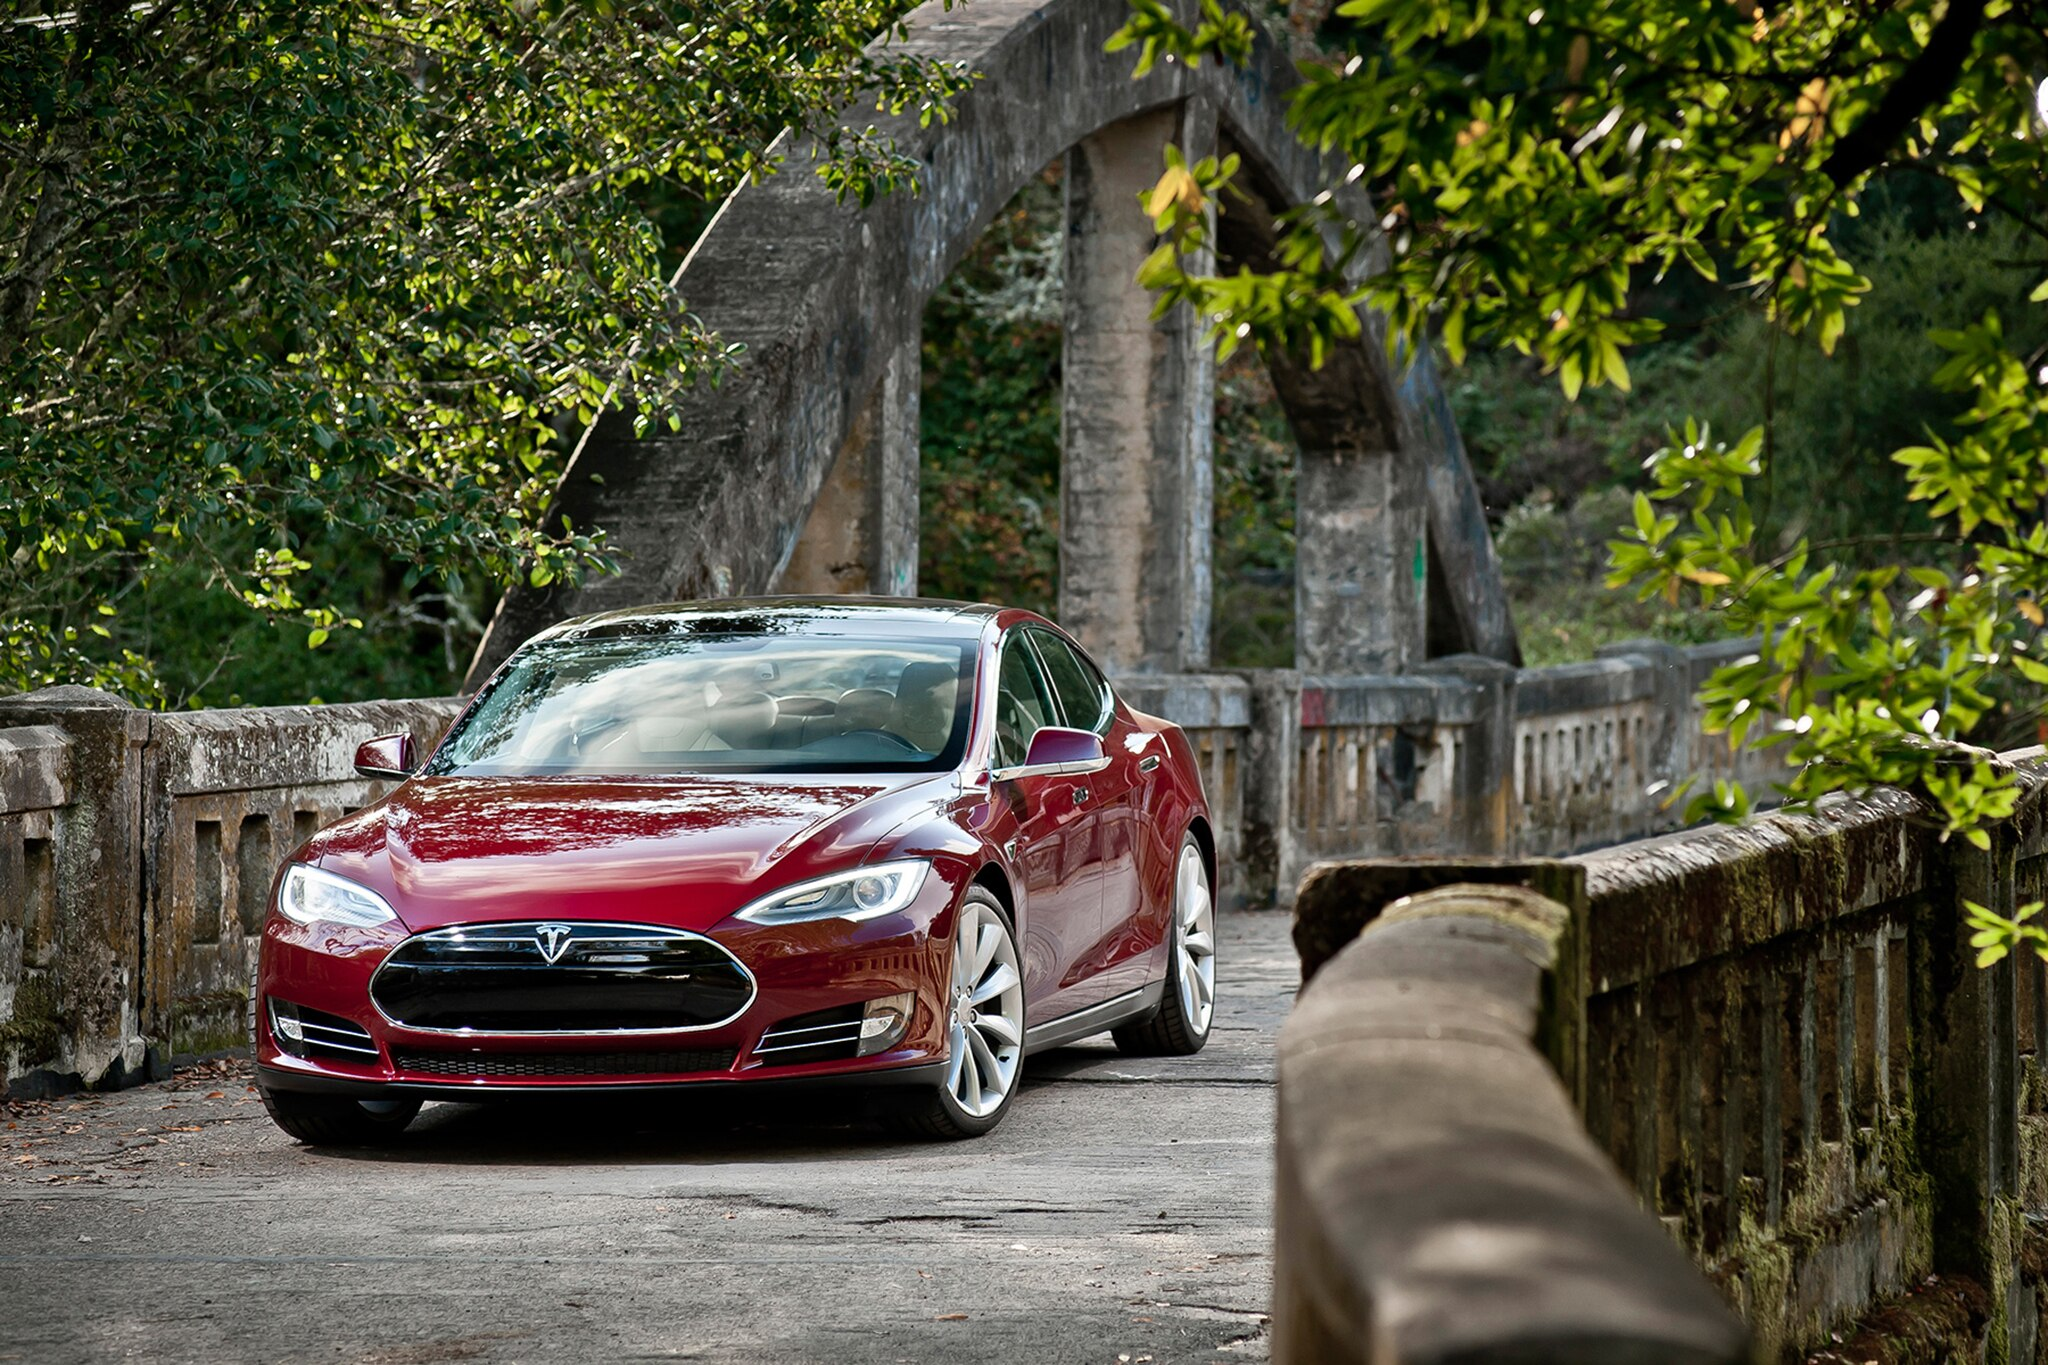 2014 Tesla Model S Front View3